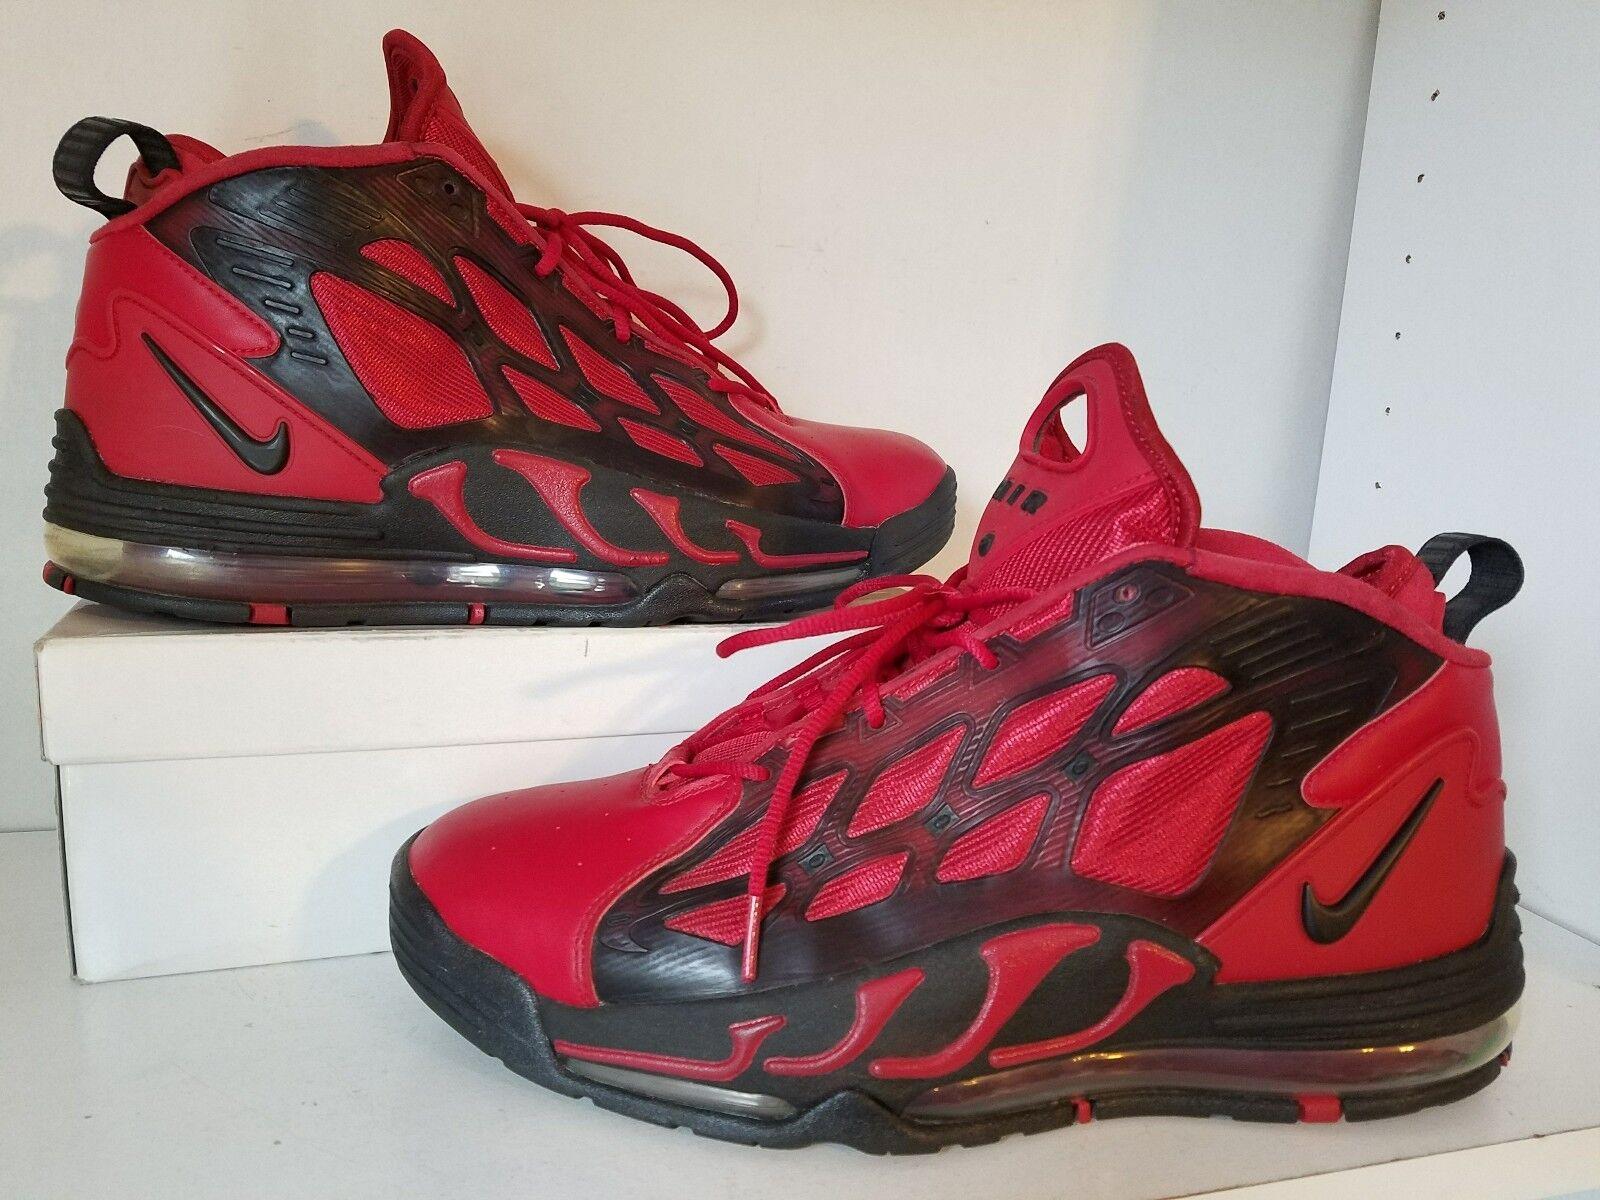 Nike air max pilastro basket rossi sz 12 525226 600